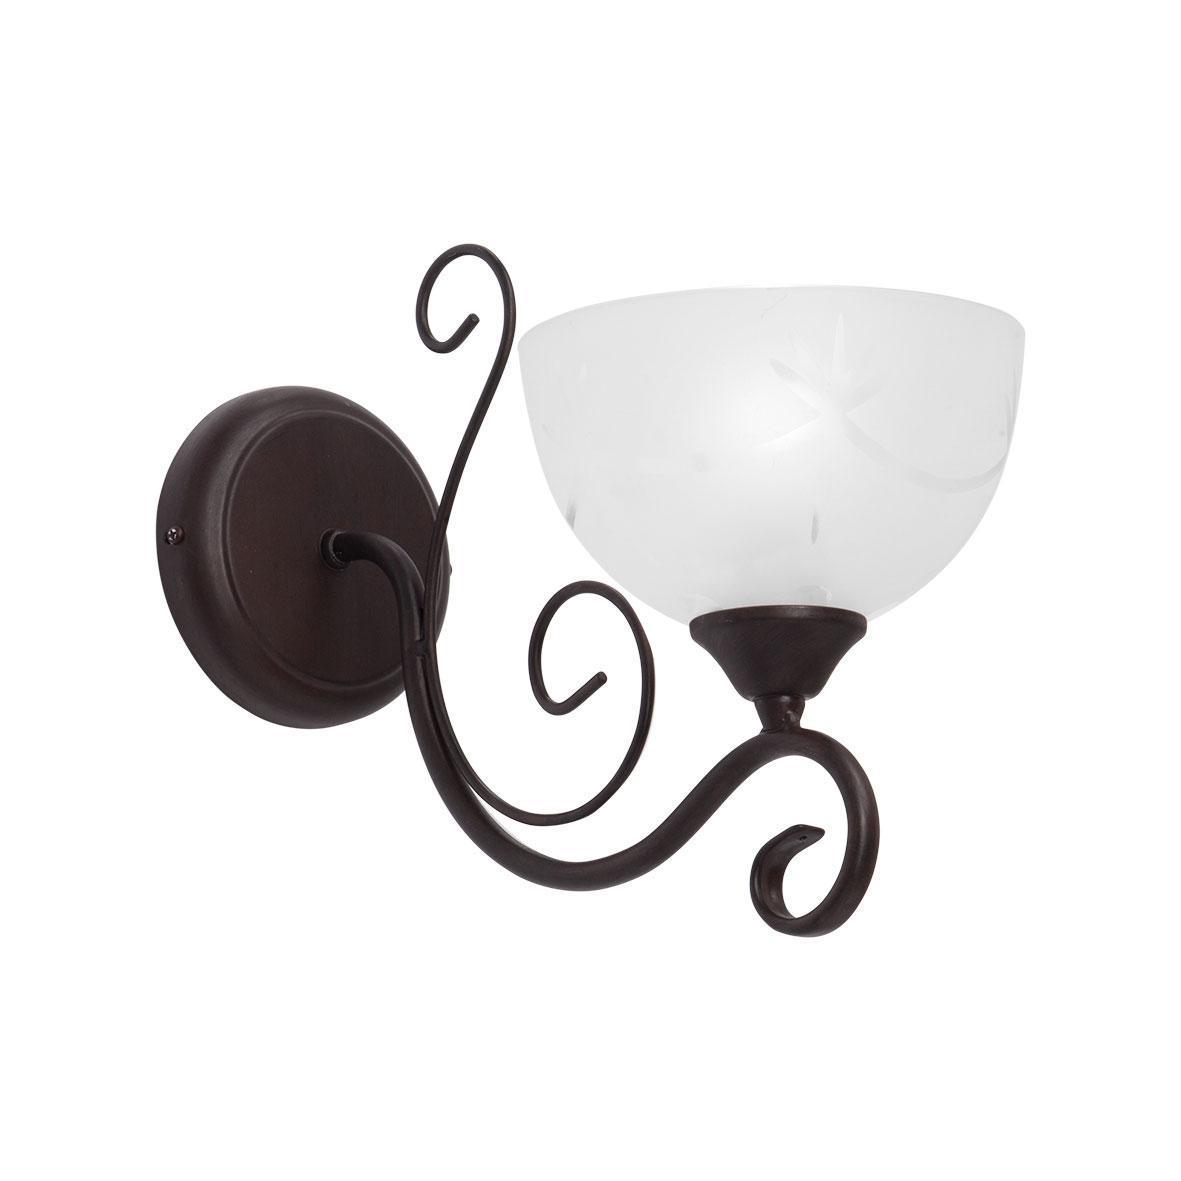 Бра Vitaluce V3730-7/1A светильник настенный vitaluce v3730 7 1a